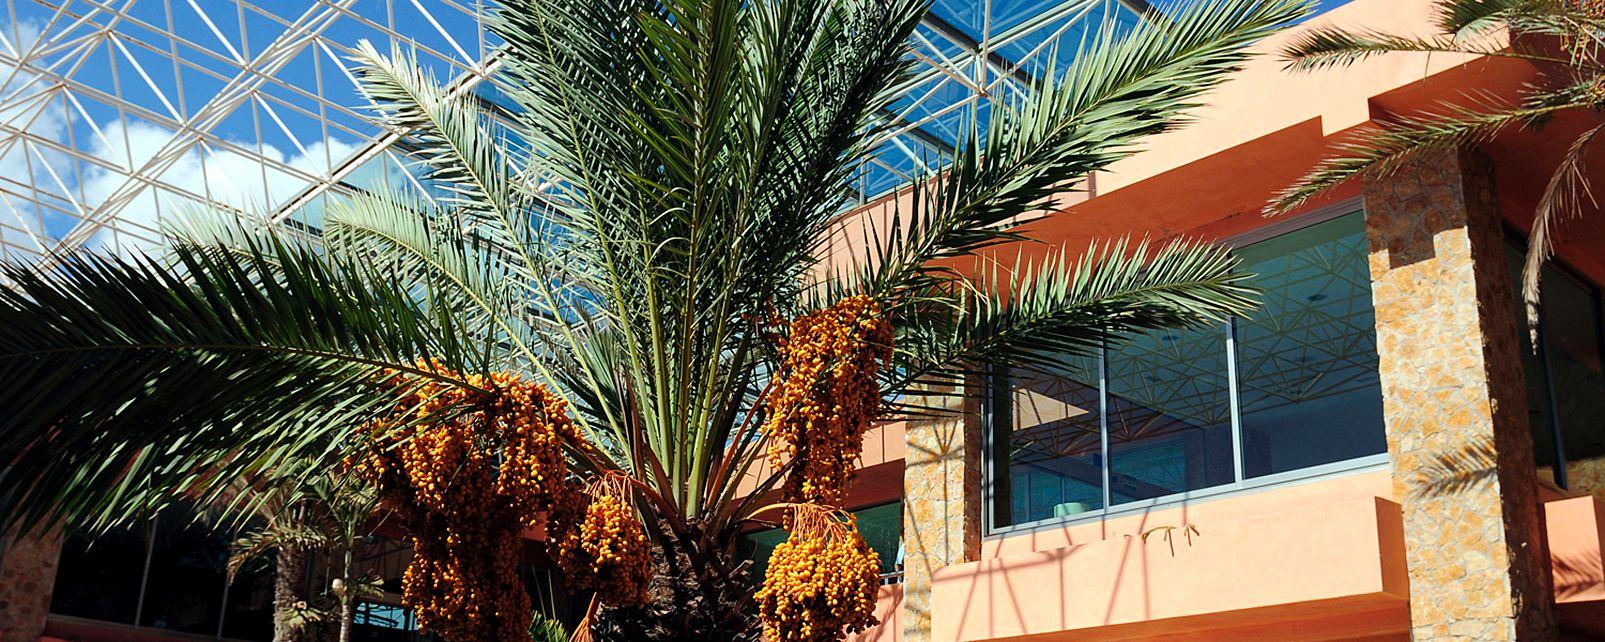 Hôtel Barcelo Fuerteventura Thalasso Spa